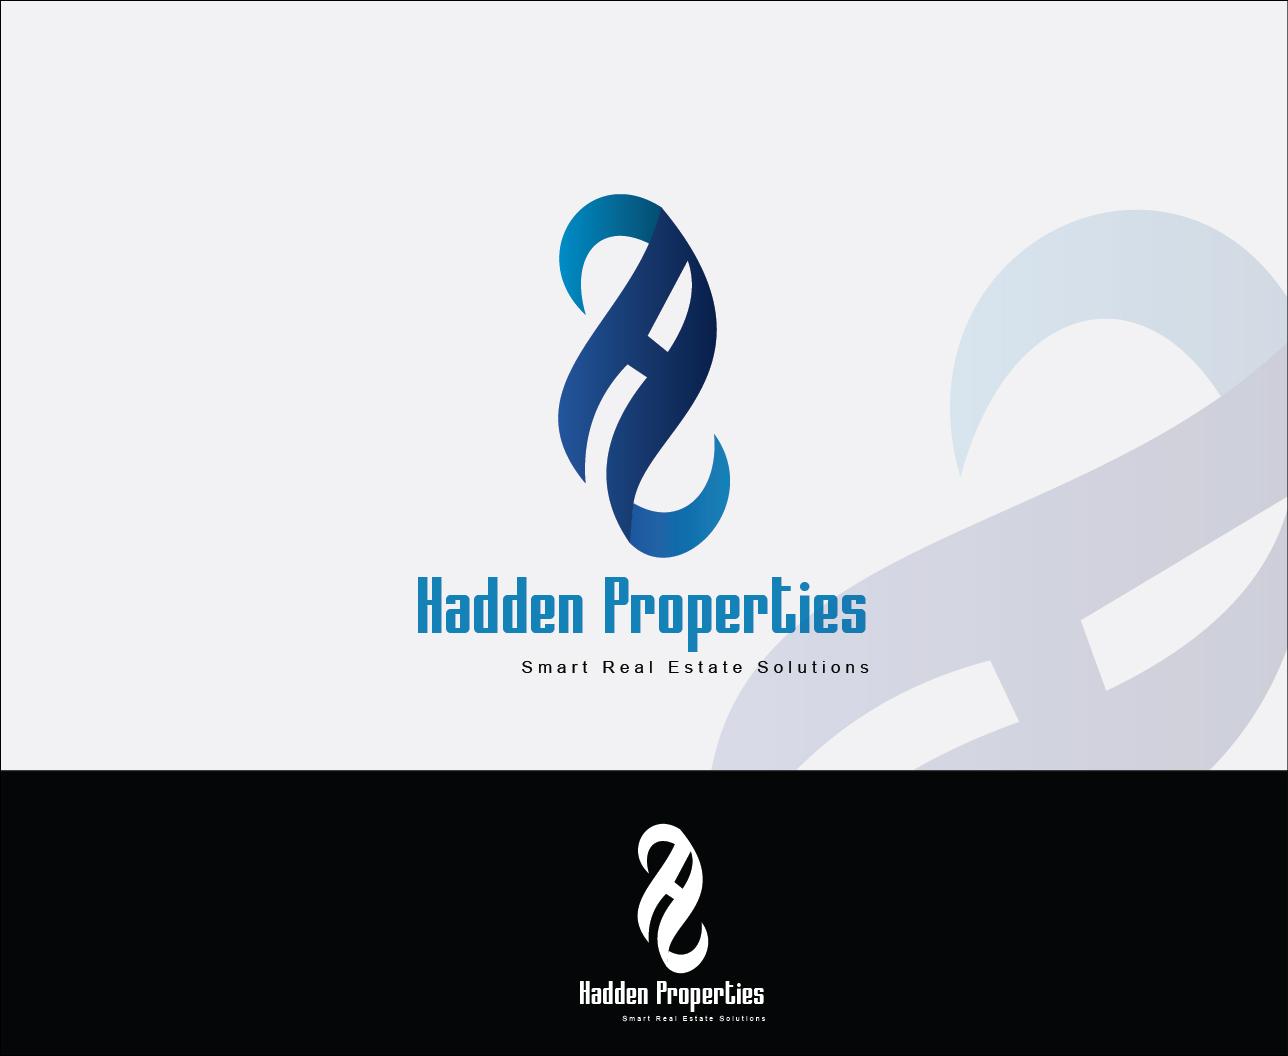 Logo Design by Derel Valarian - Entry No. 116 in the Logo Design Contest Artistic Logo Design for Hadden Properties.